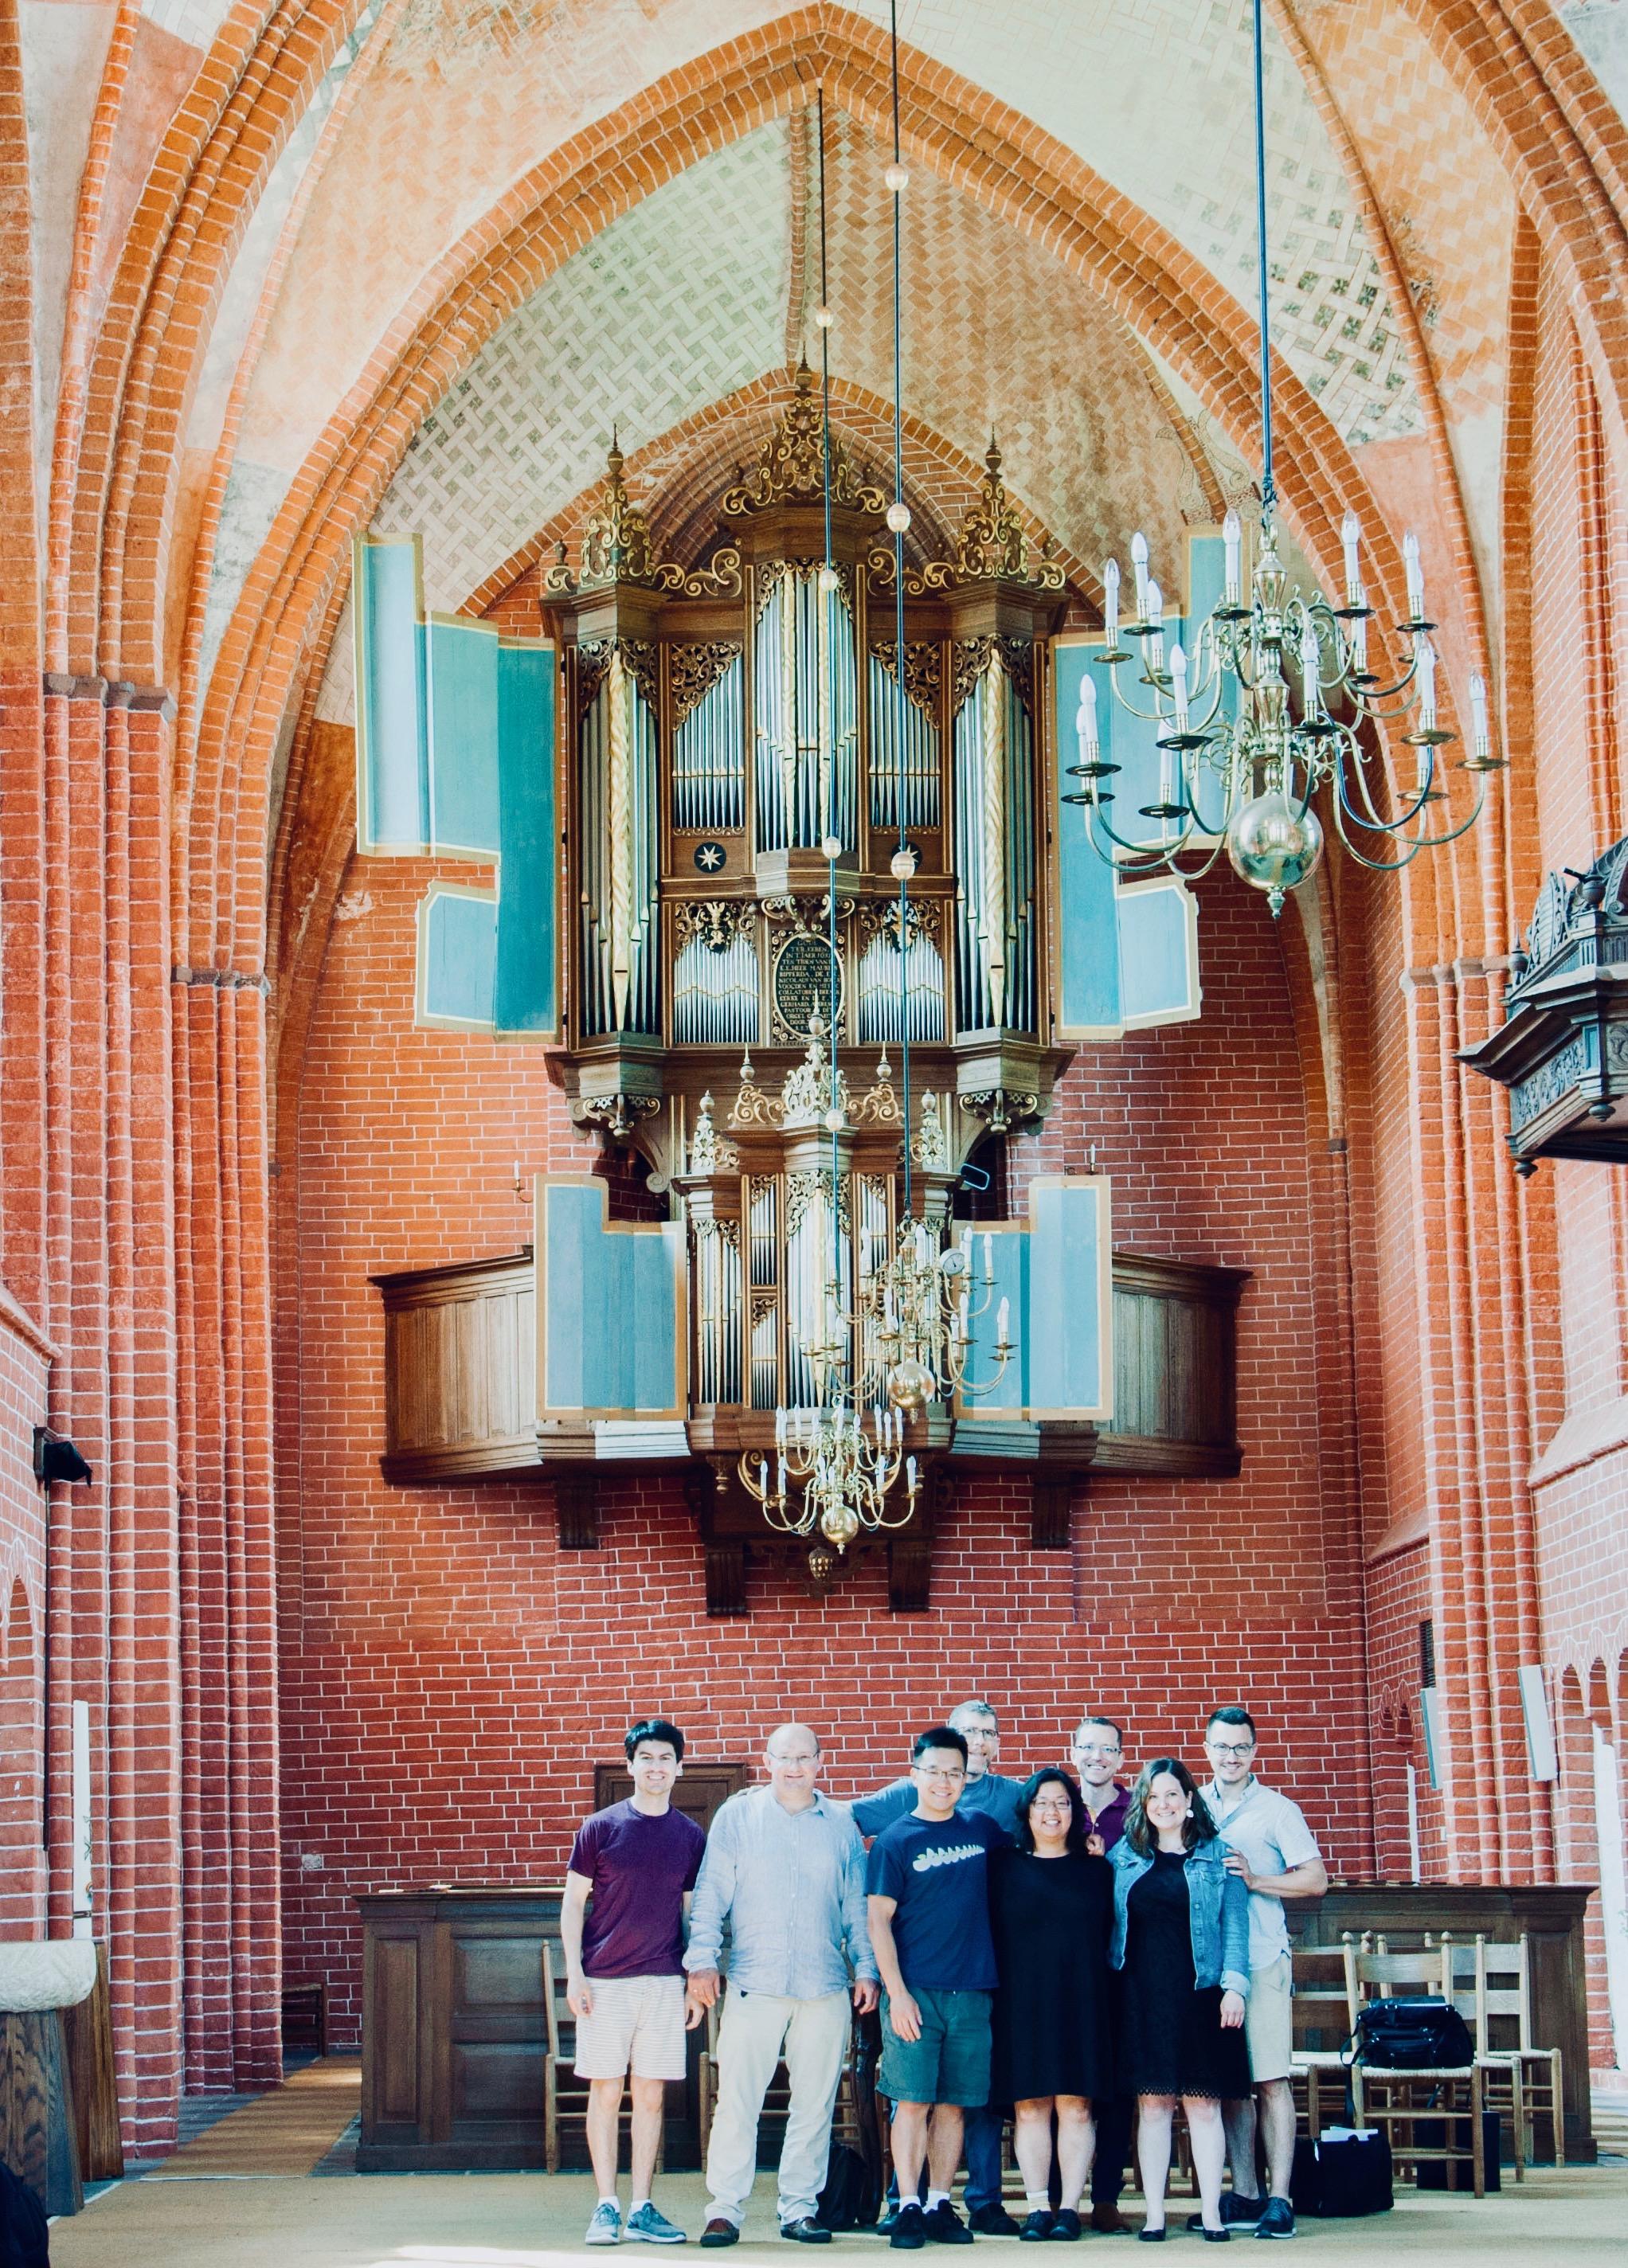 Members of Boston Organ Studio in Zeerijp, Holland.